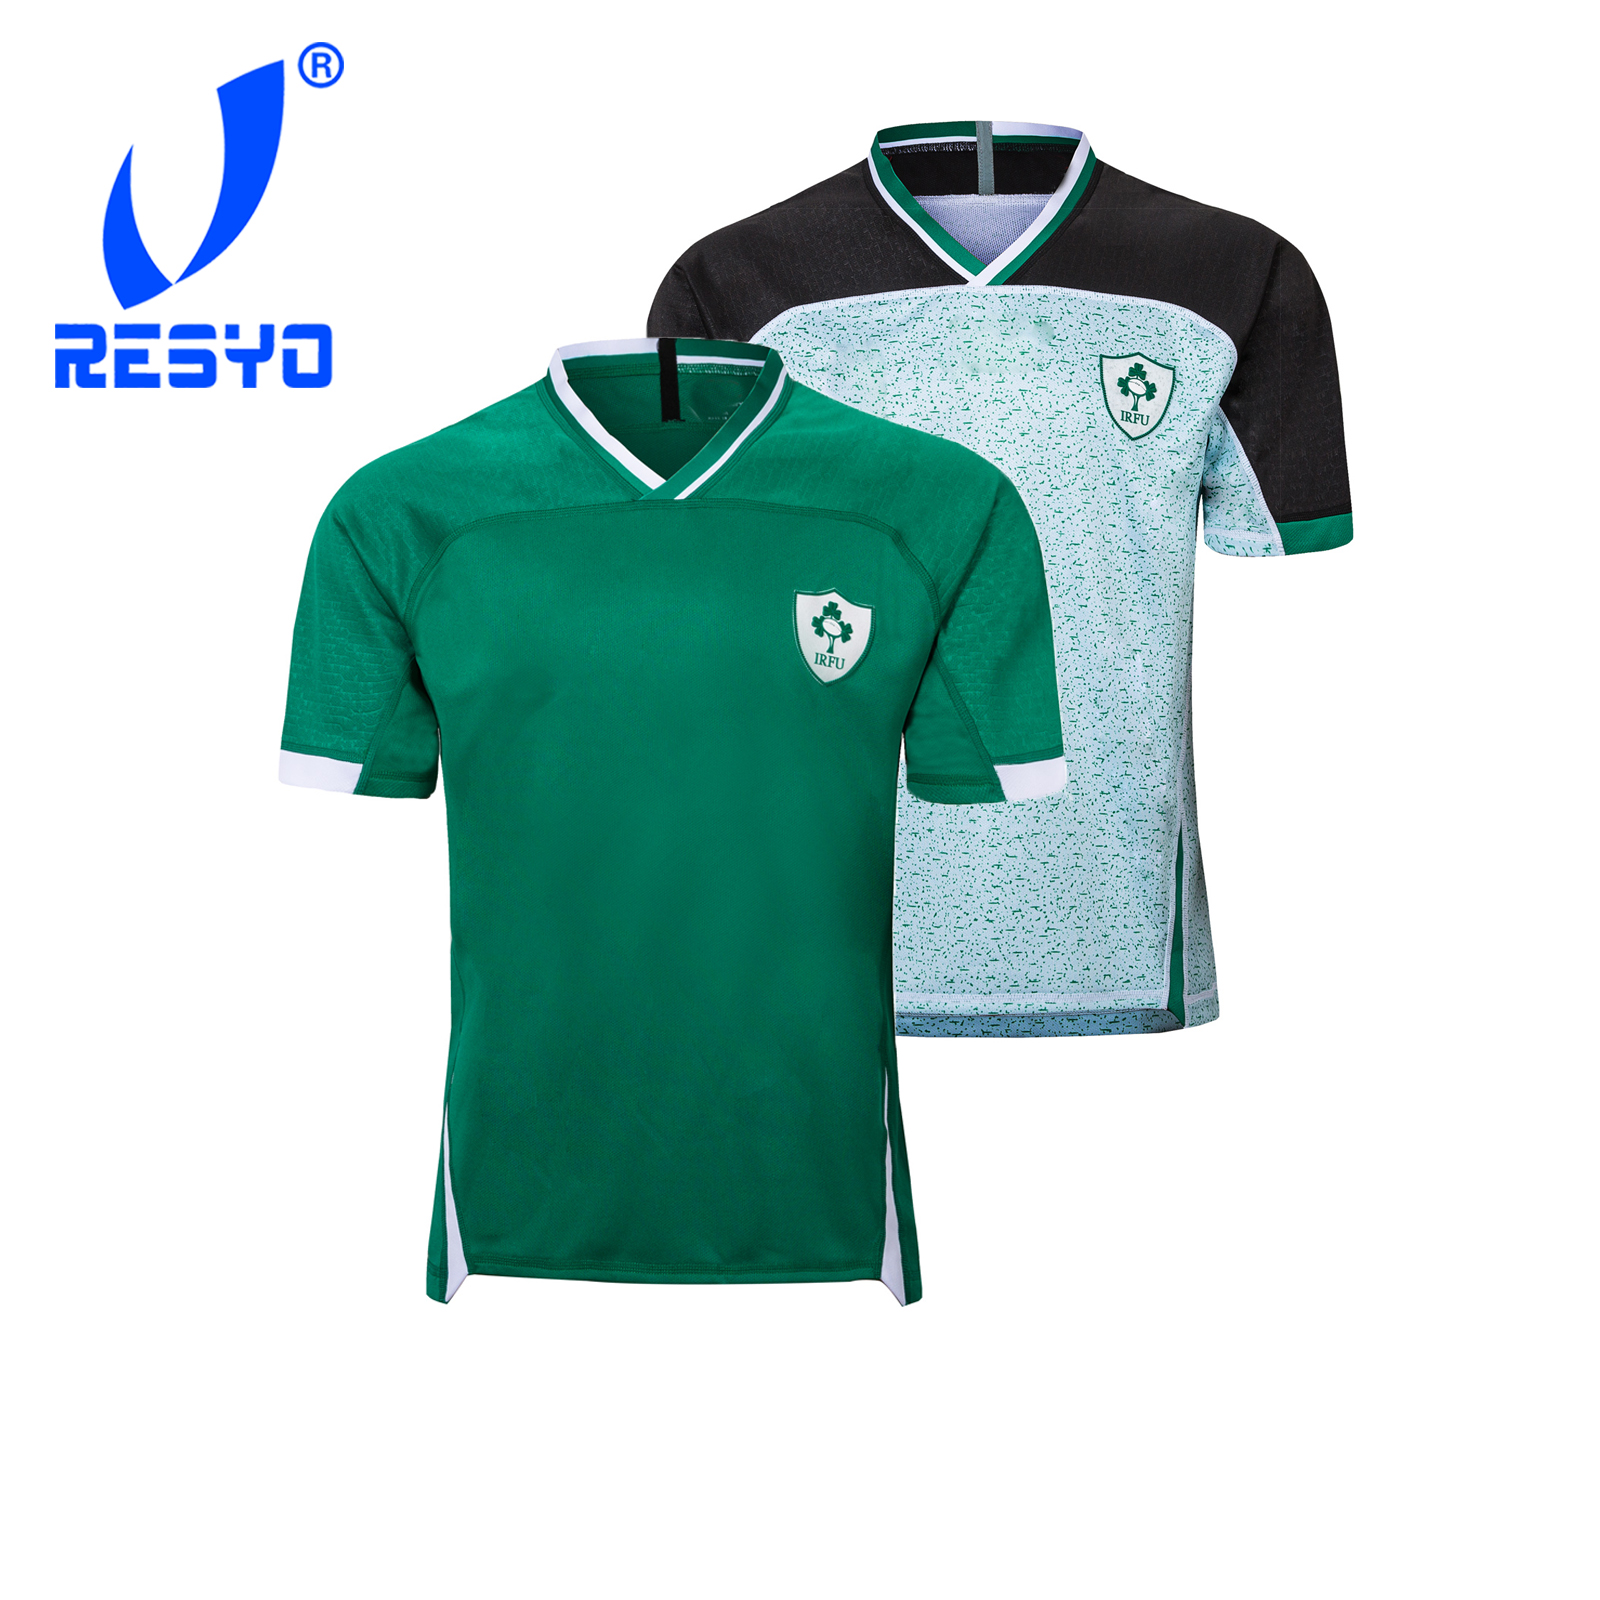 Resyo para 2019 irlanda rwc masculino camisa de rugby esporte S-5XL